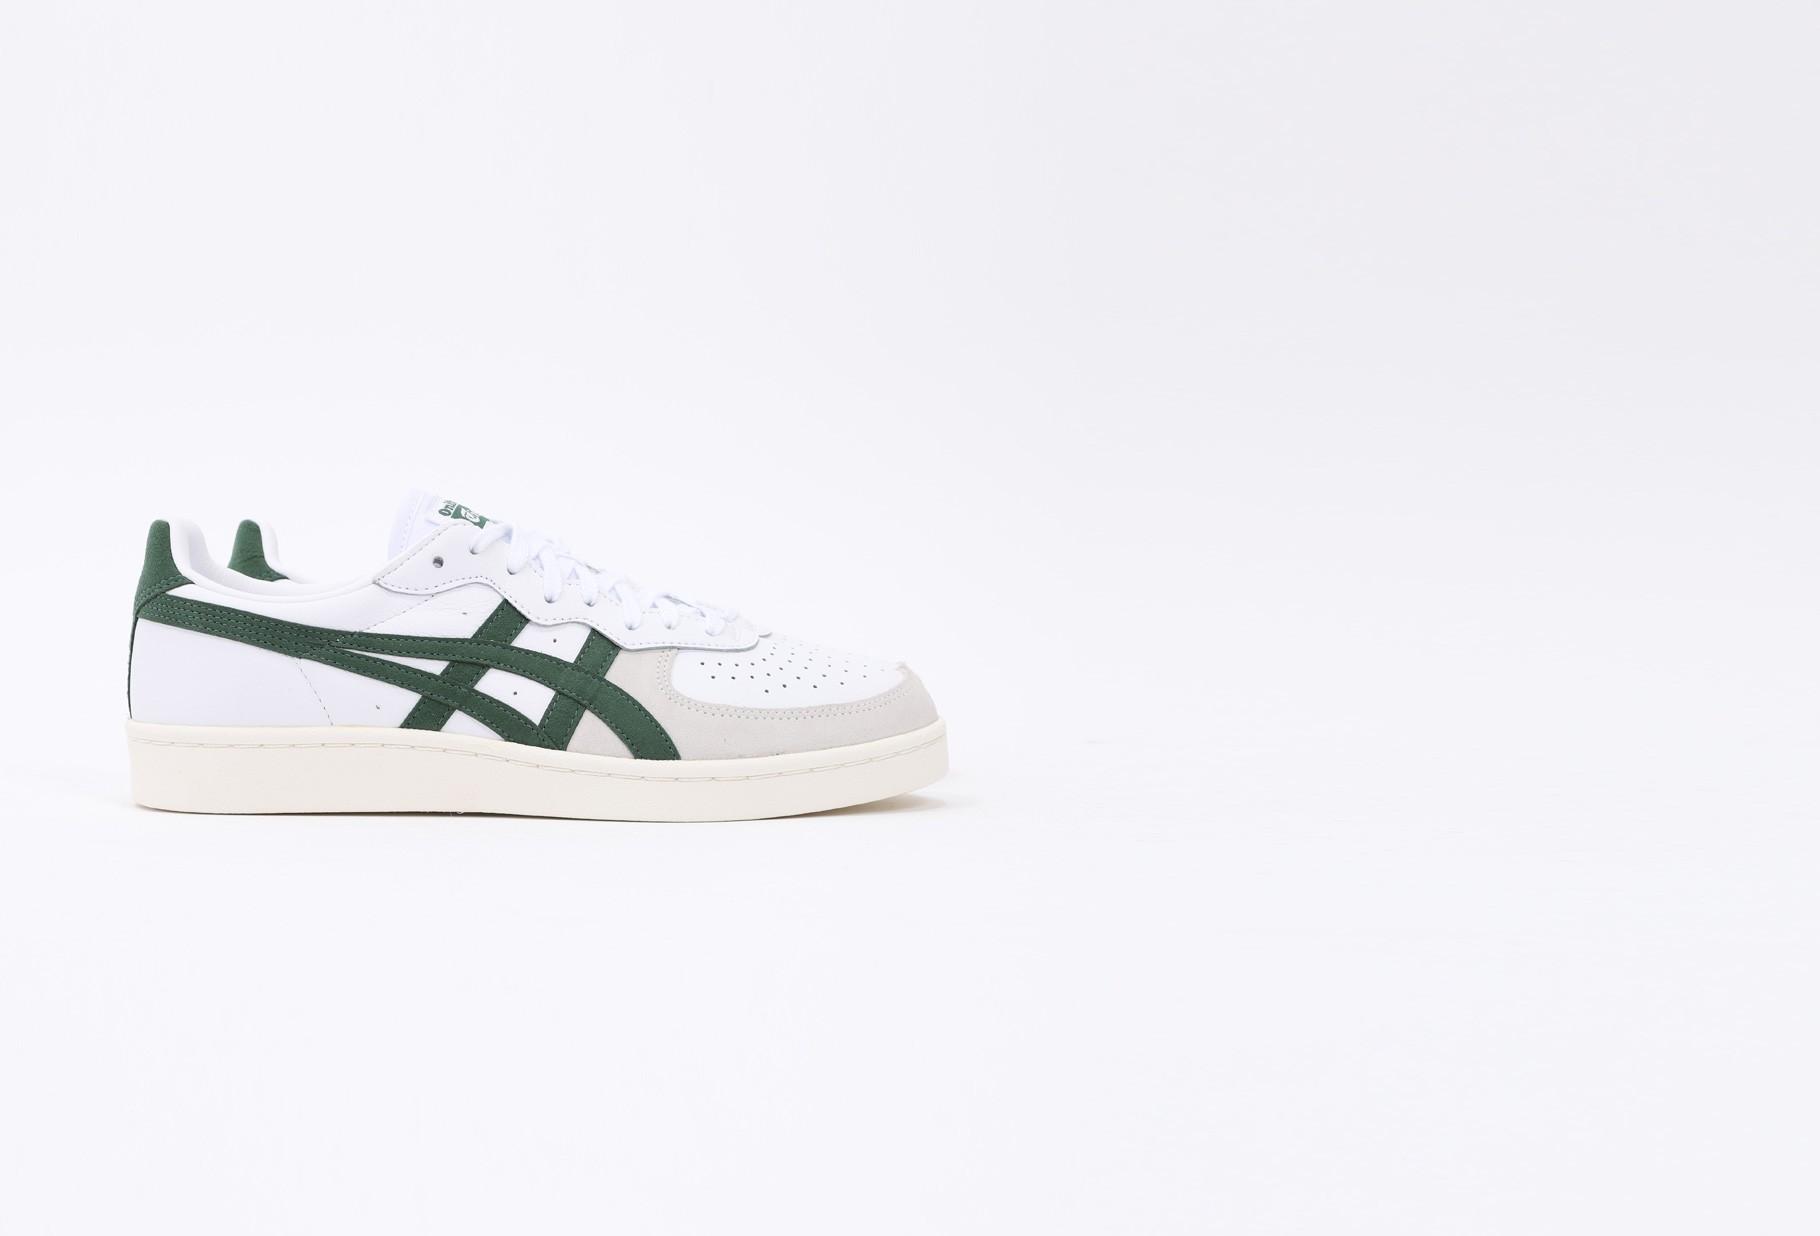 sale retailer 3ee0a 98bfa Onitsuka tiger gsm White hunter green